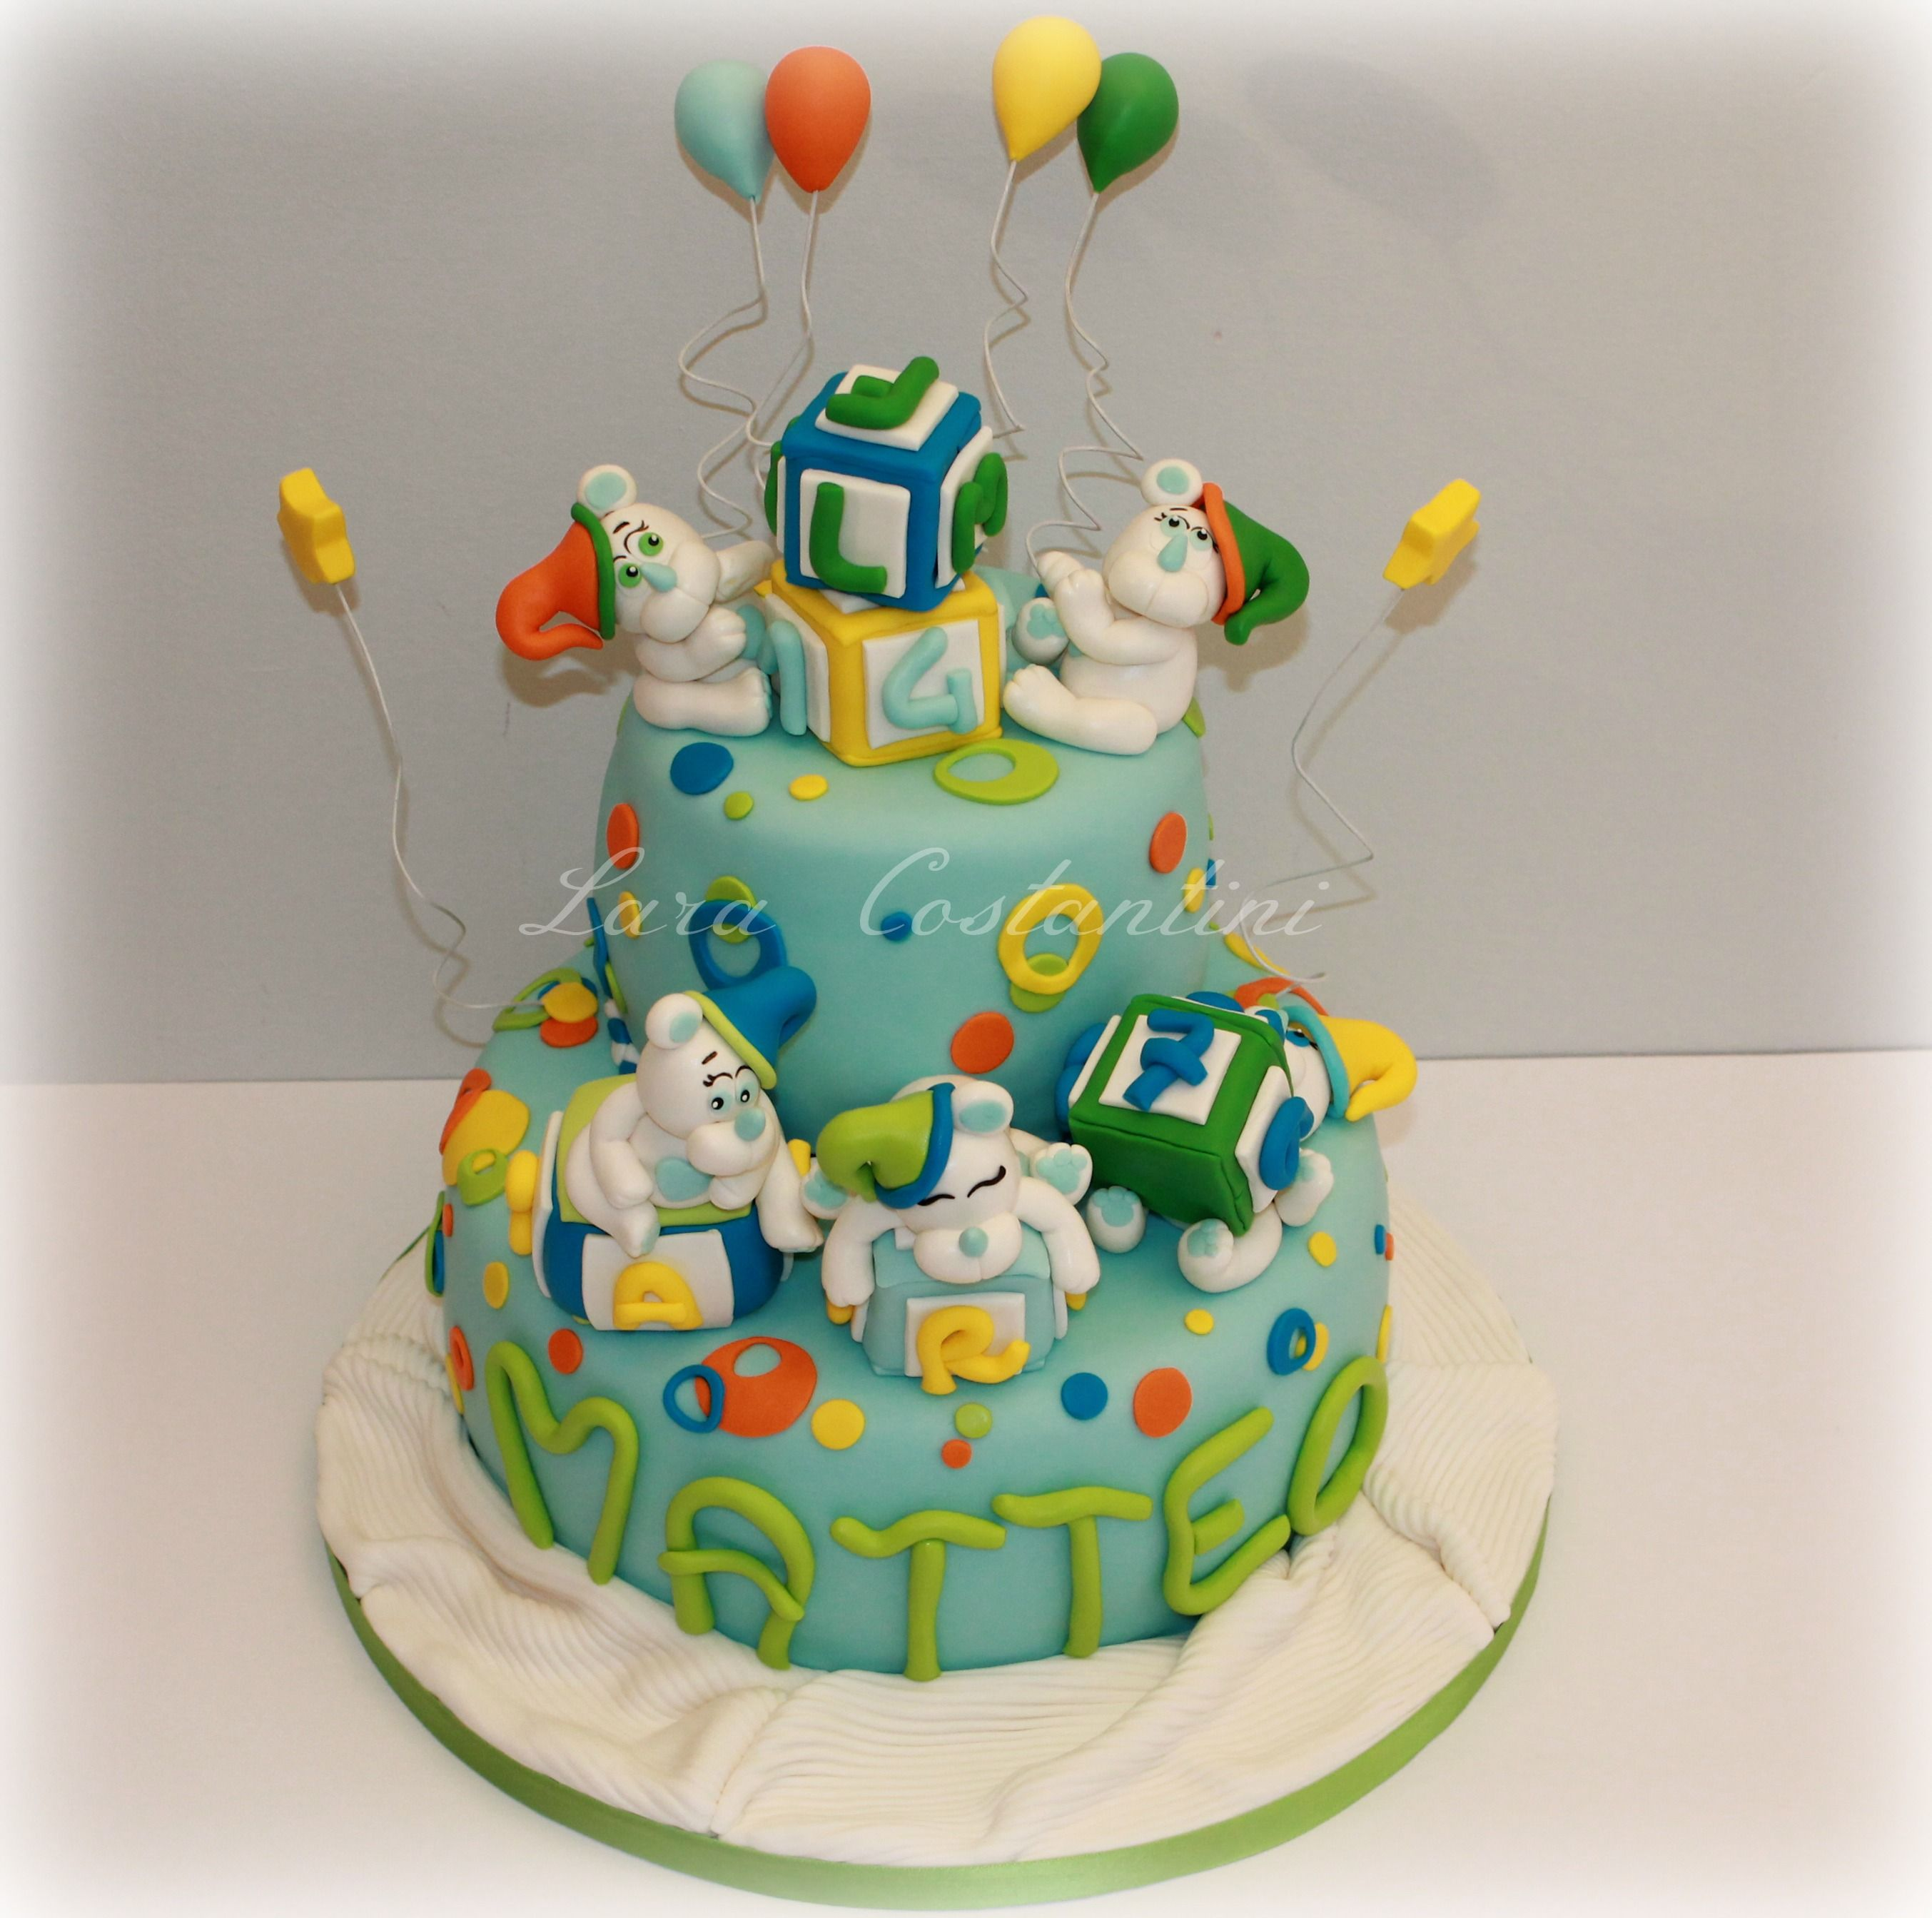 Favorito Pinterest Torte Compleanno OD91 » Regardsdefemmes RJ32